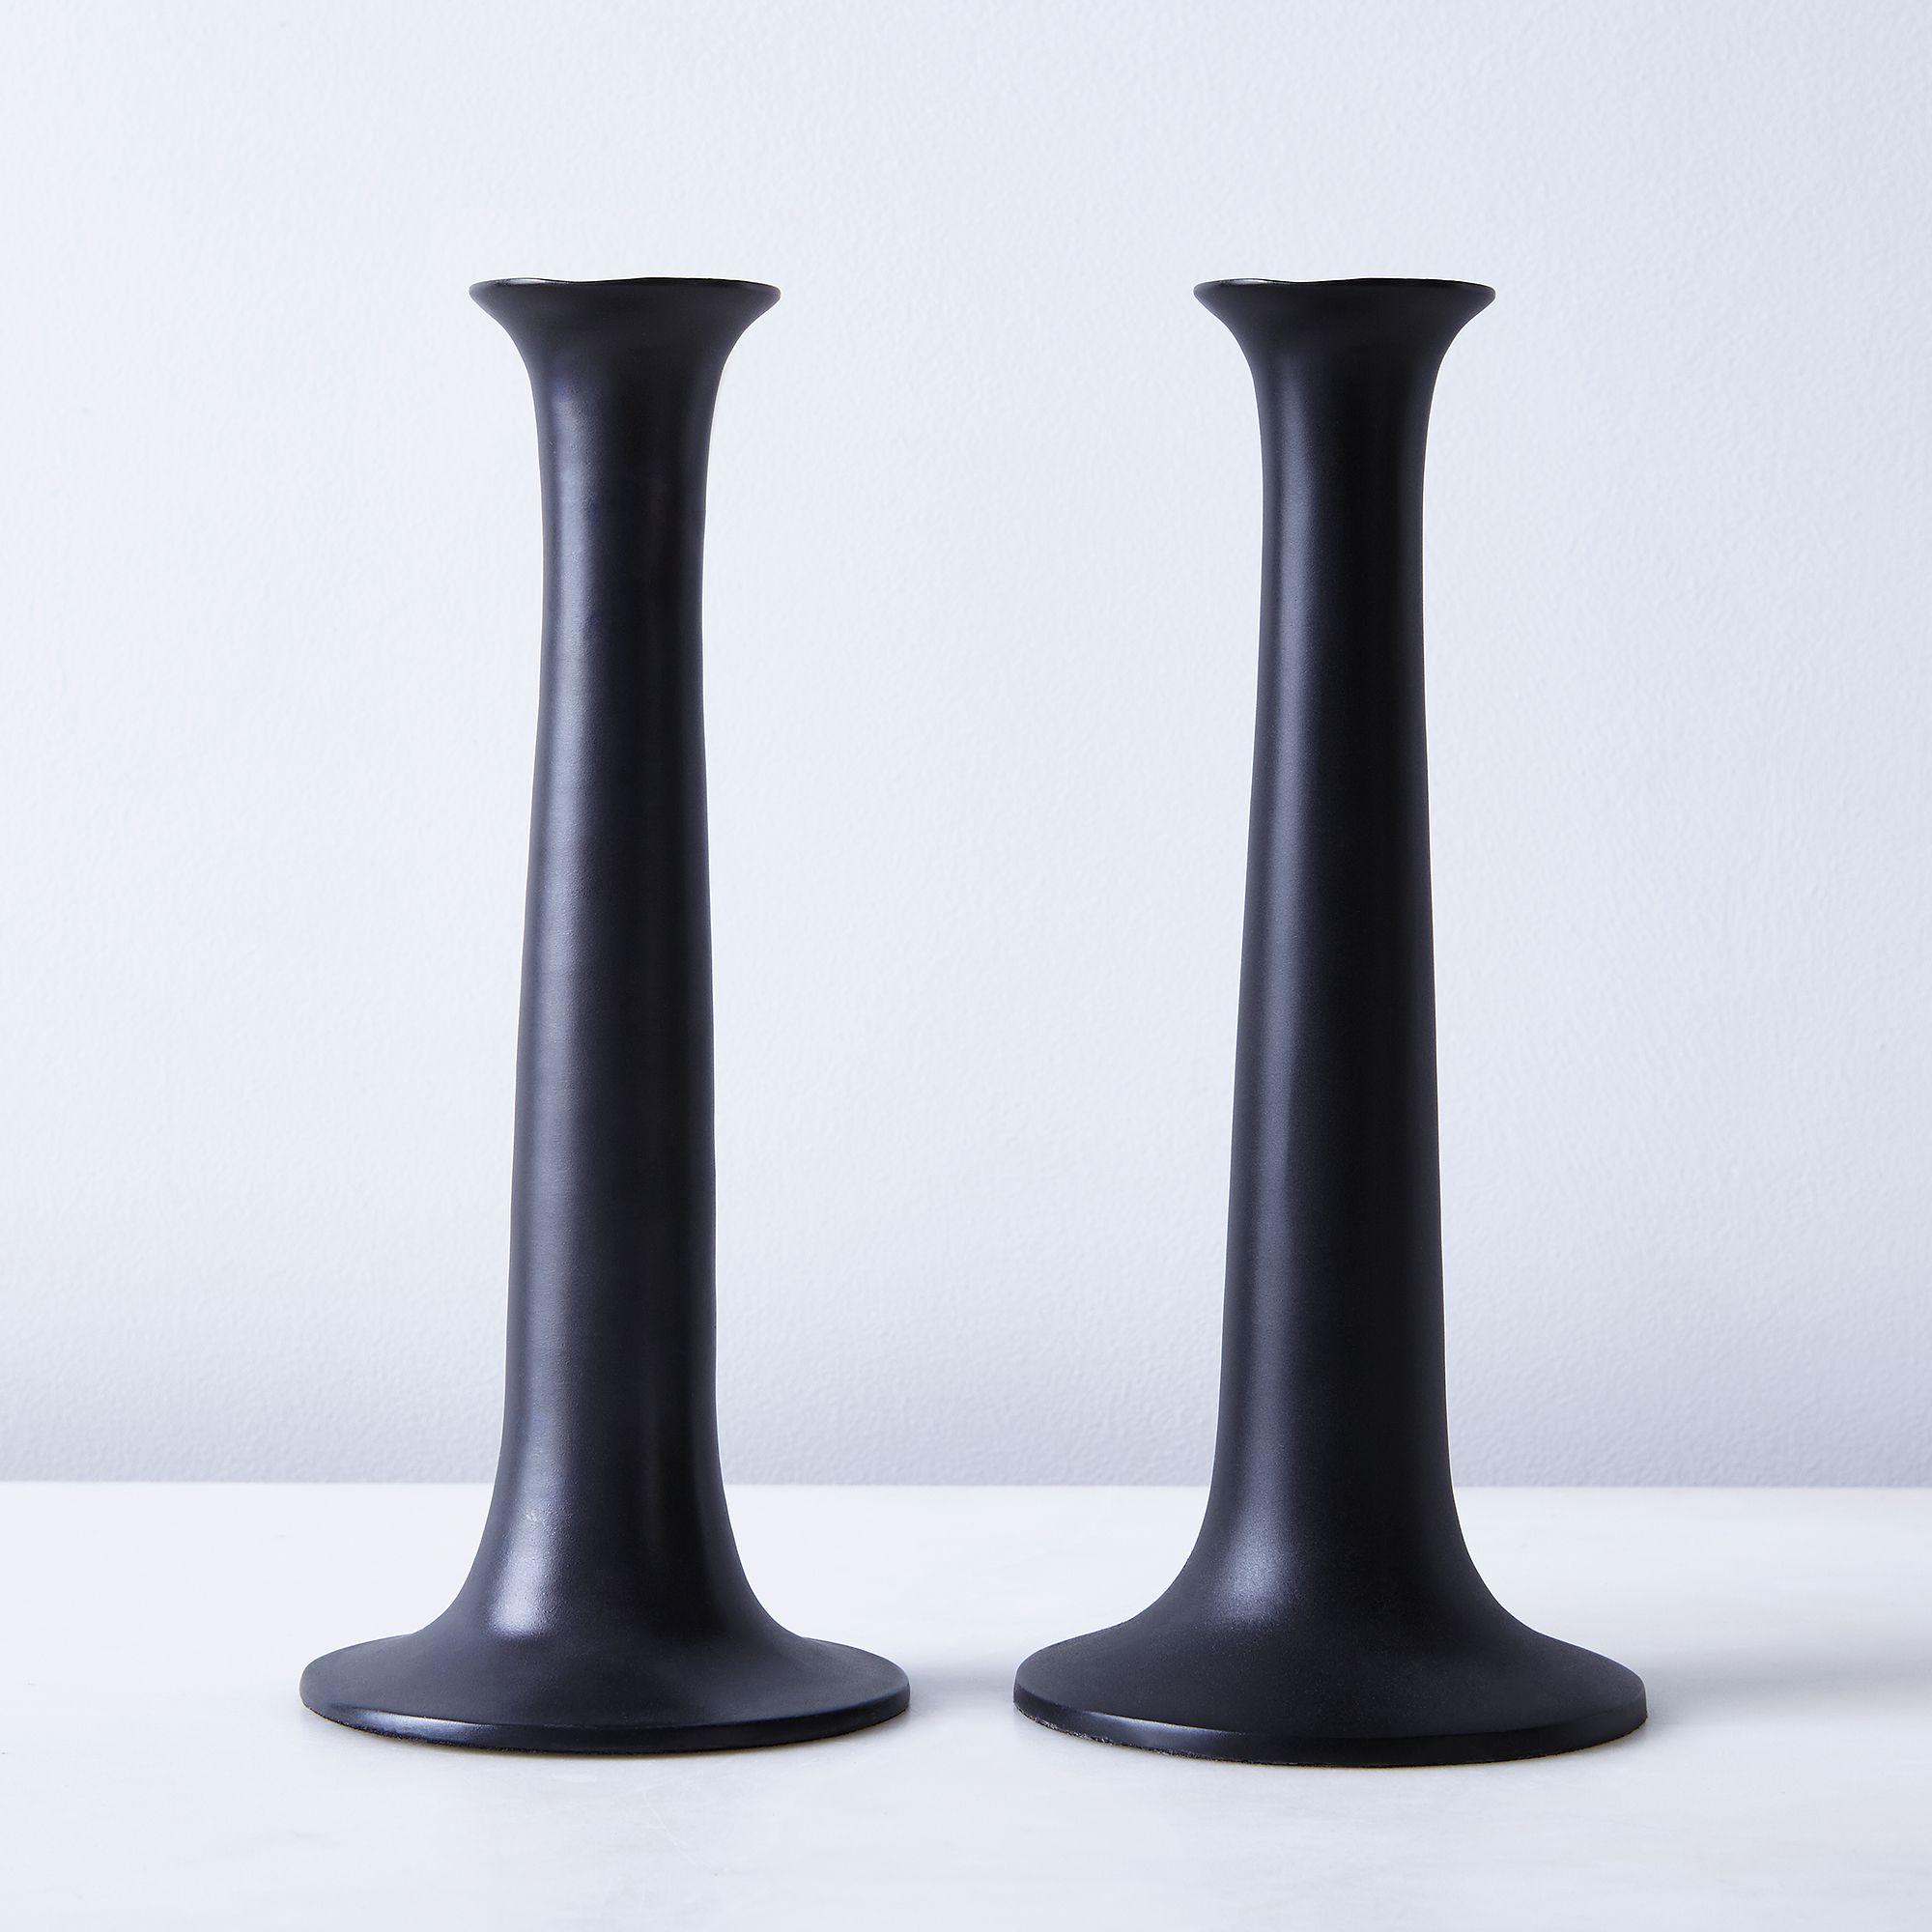 Fa442d15 f94e 4690 9b43 b6e45416d128  2016 1011 hawkins new york black candlesticks large set of 2 silo rocky luten 0786